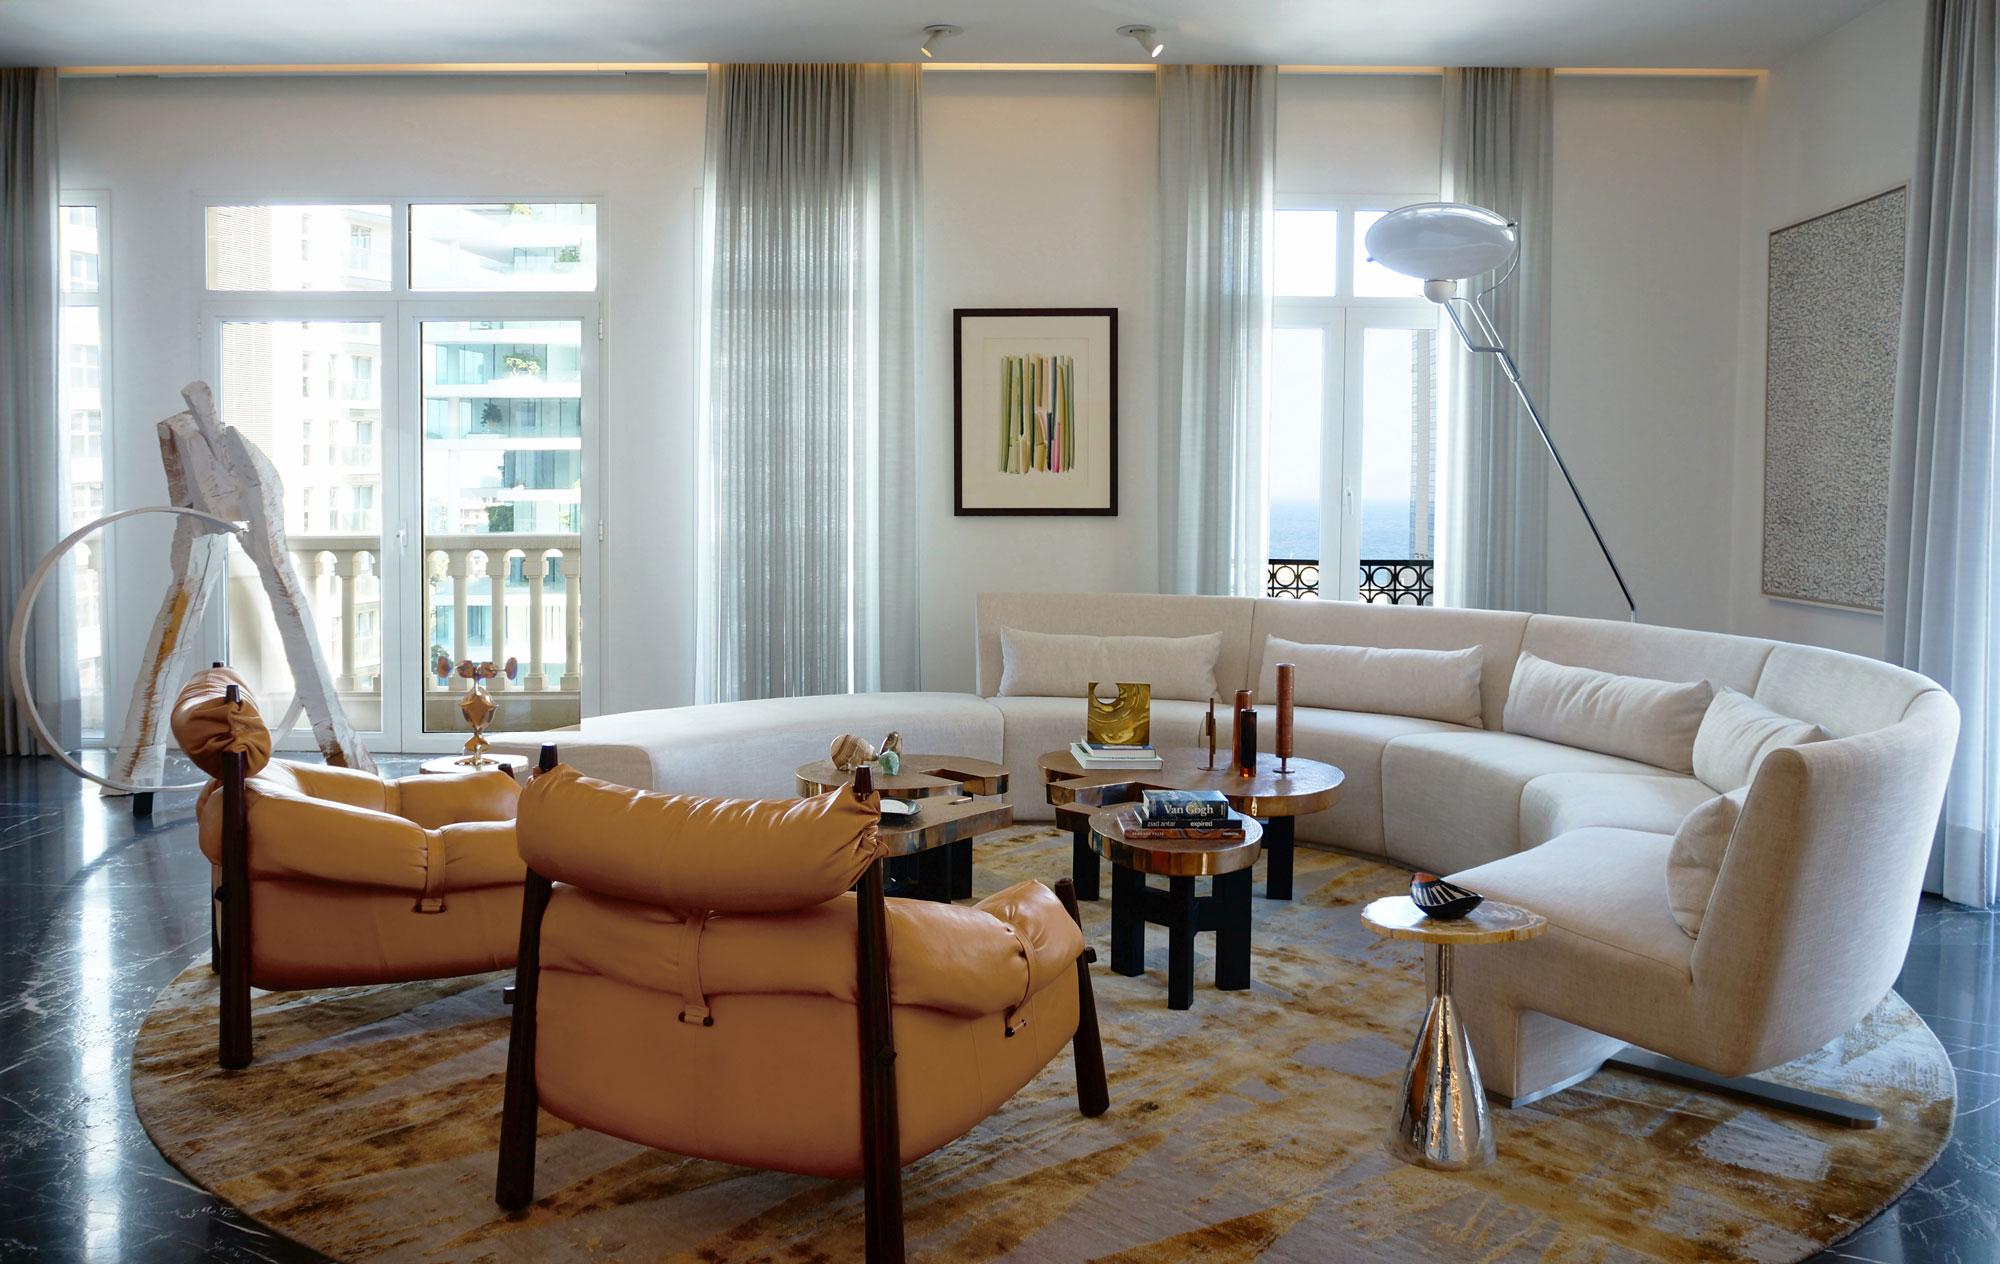 gatserelia design - top interior designers - living rooms - living room ideas - photography by ewa szumilas restaurant design Glowing Vienna Restaurant Design by Gatserelia F